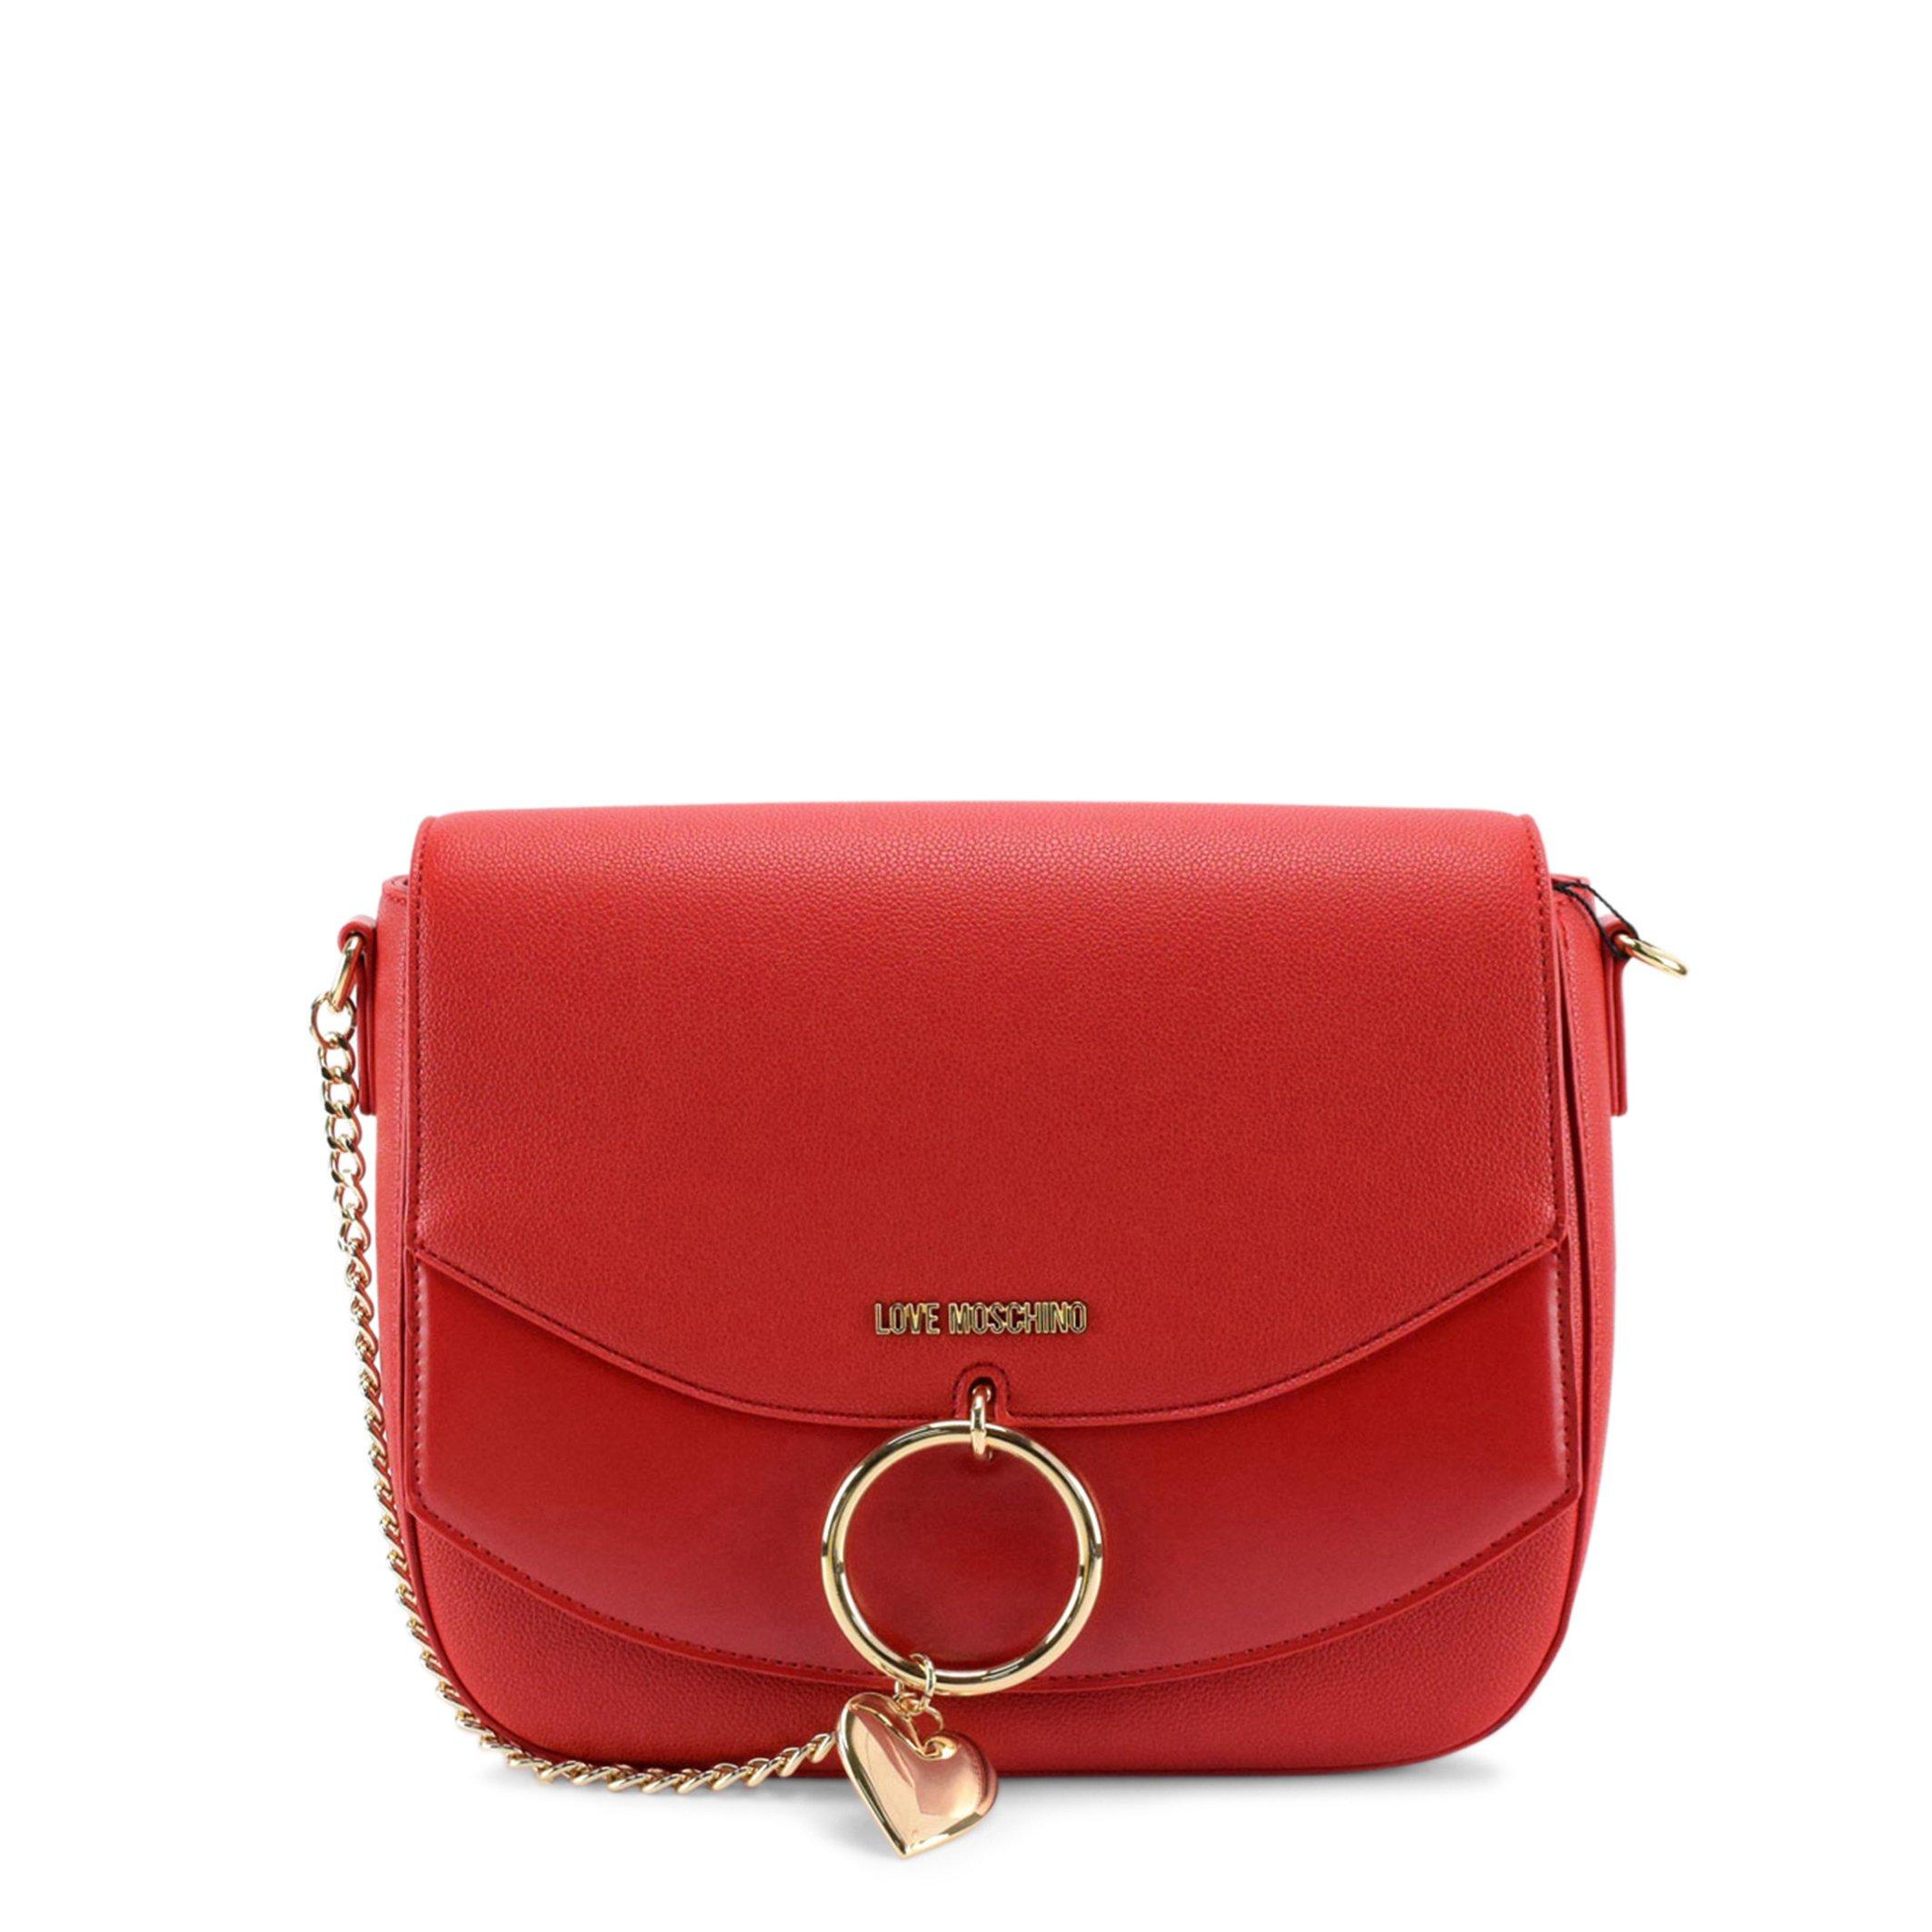 Love Moschino Women's Crpssbody Bag Black JC4236PP0CKF1 - red NOSIZE